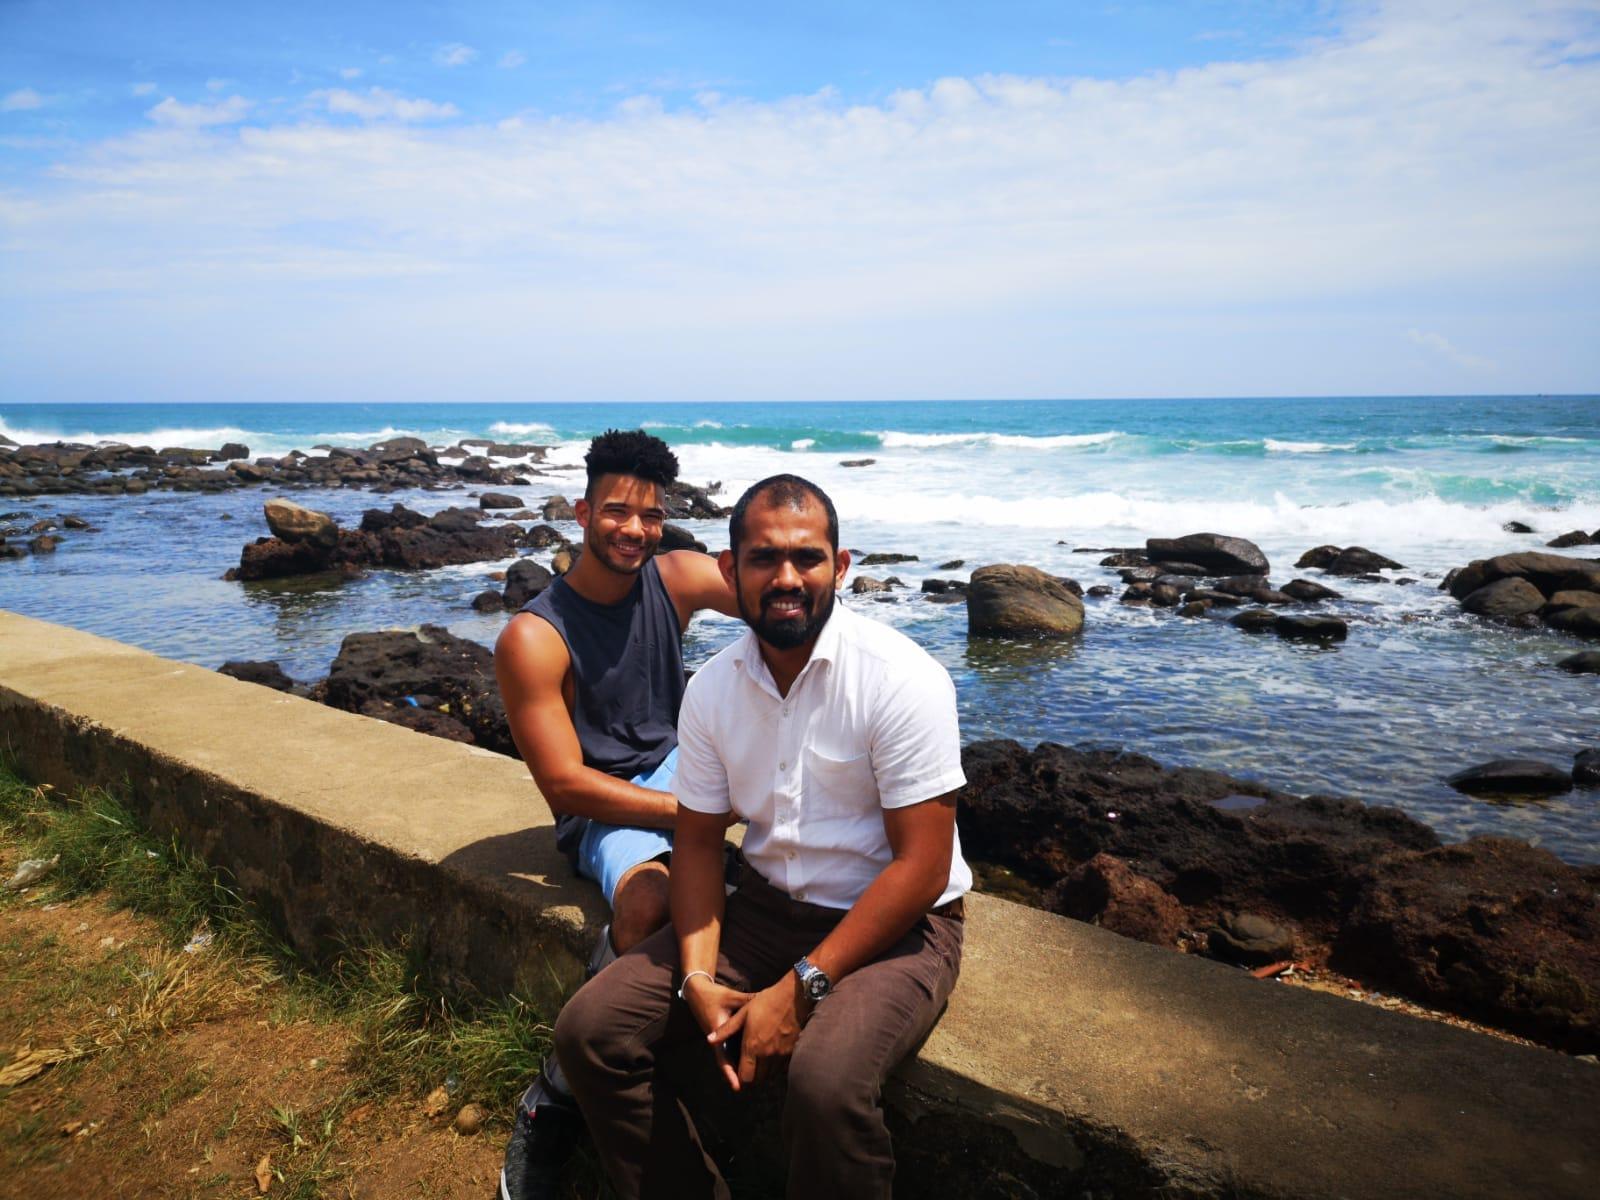 invite-to-paradise-sri-lanka-holiday-honeymoon-specialists-customer-feedback-elin-jordan-luce-chauffeur-guide-ruchira-galle-fort.JPG